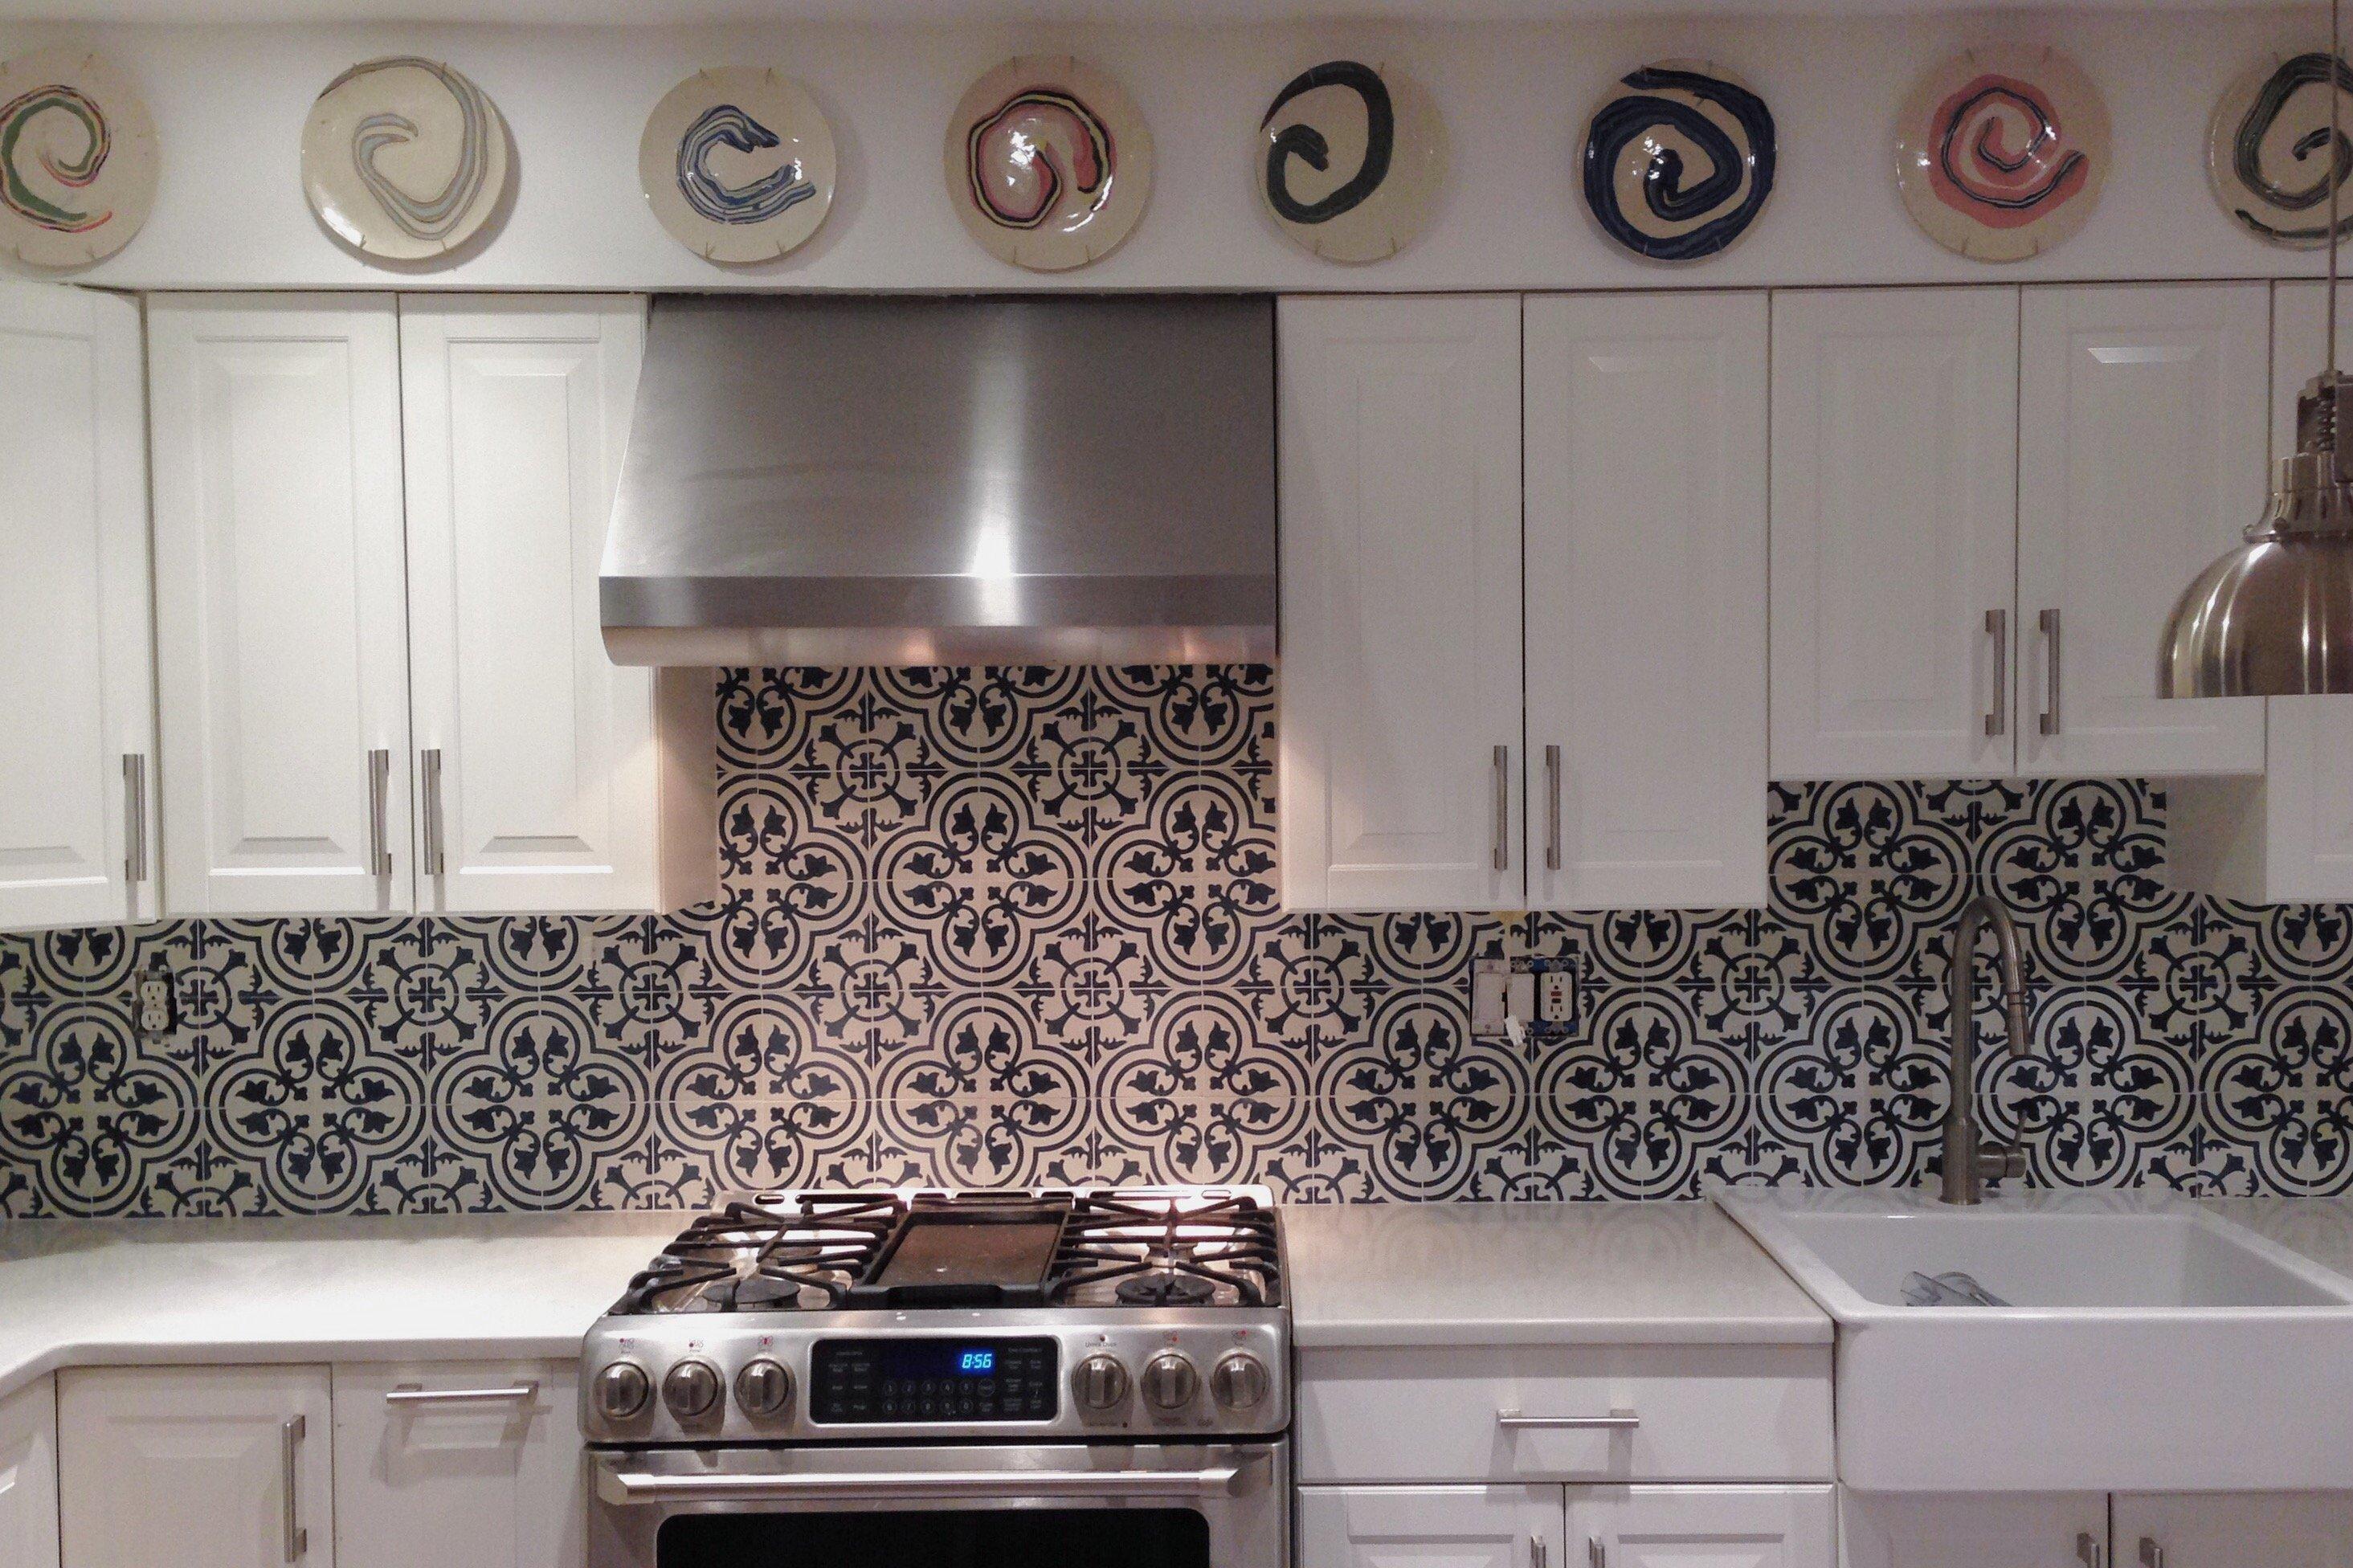 Cement tile kitchen backsplash.